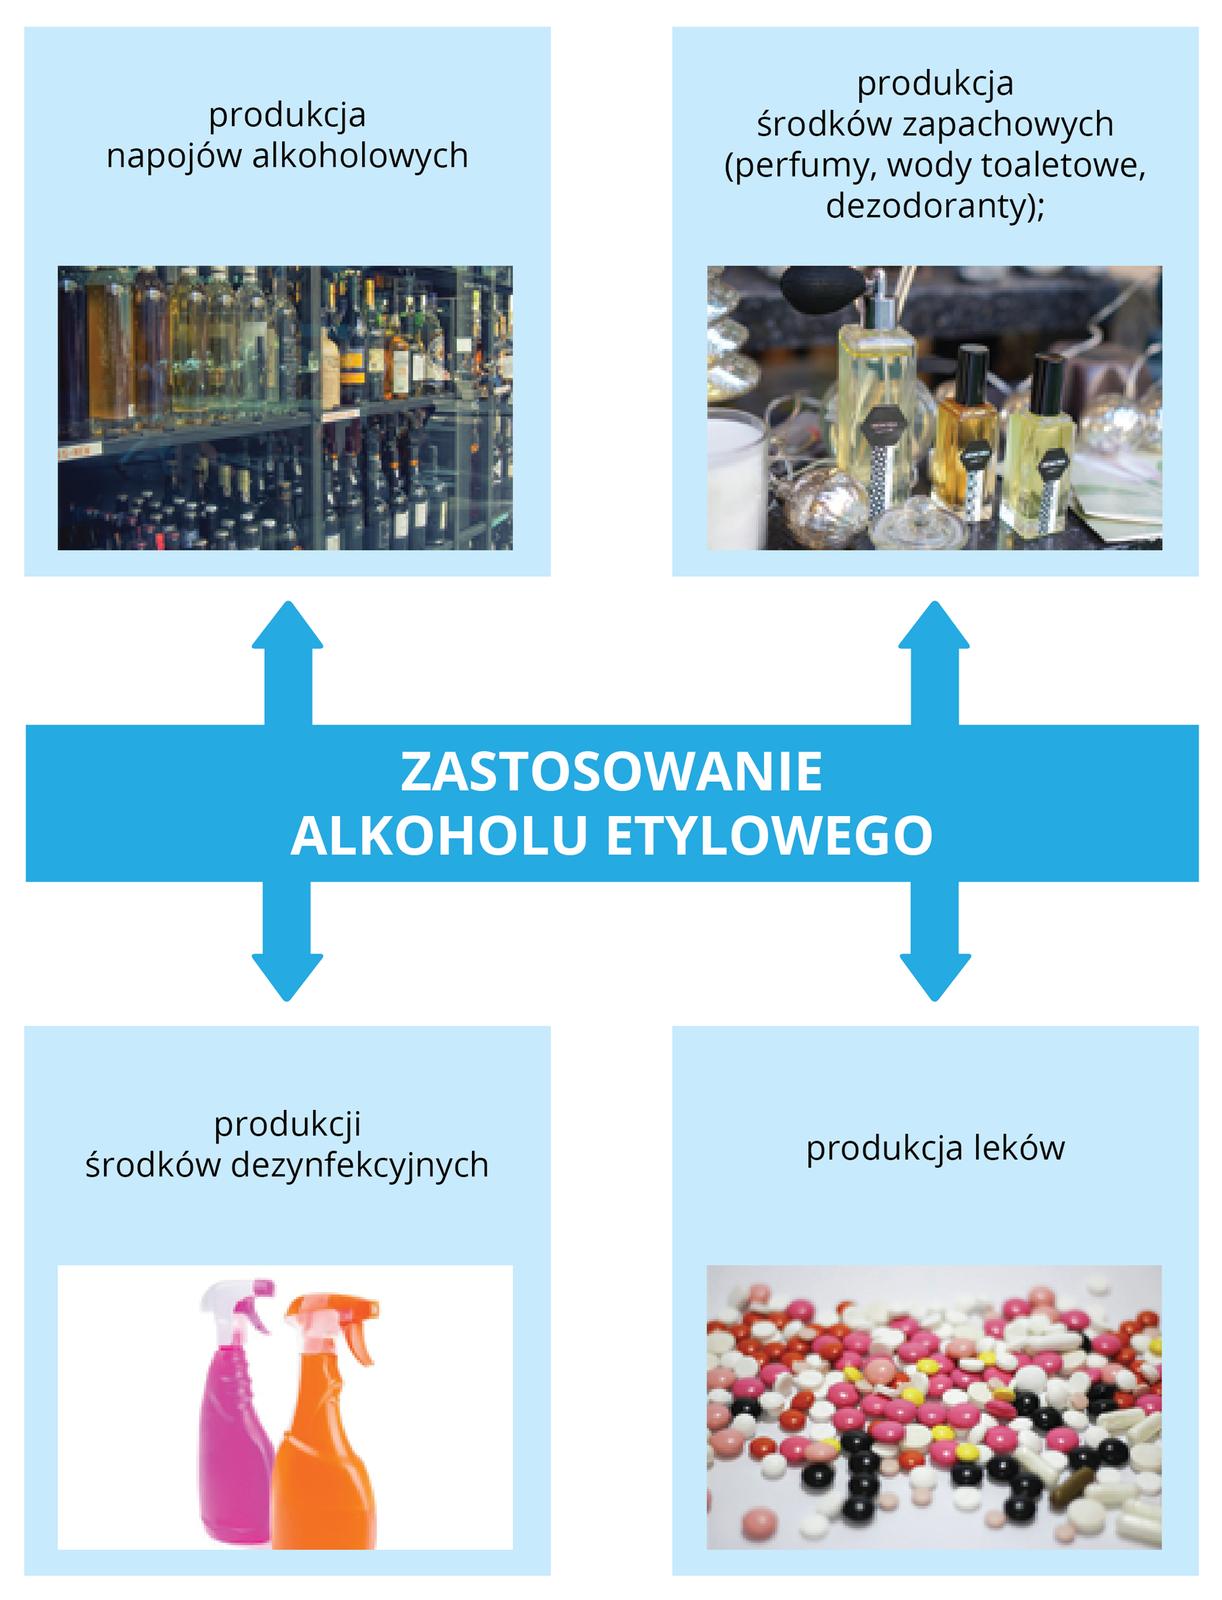 Zastosowania alkoholu etylowego